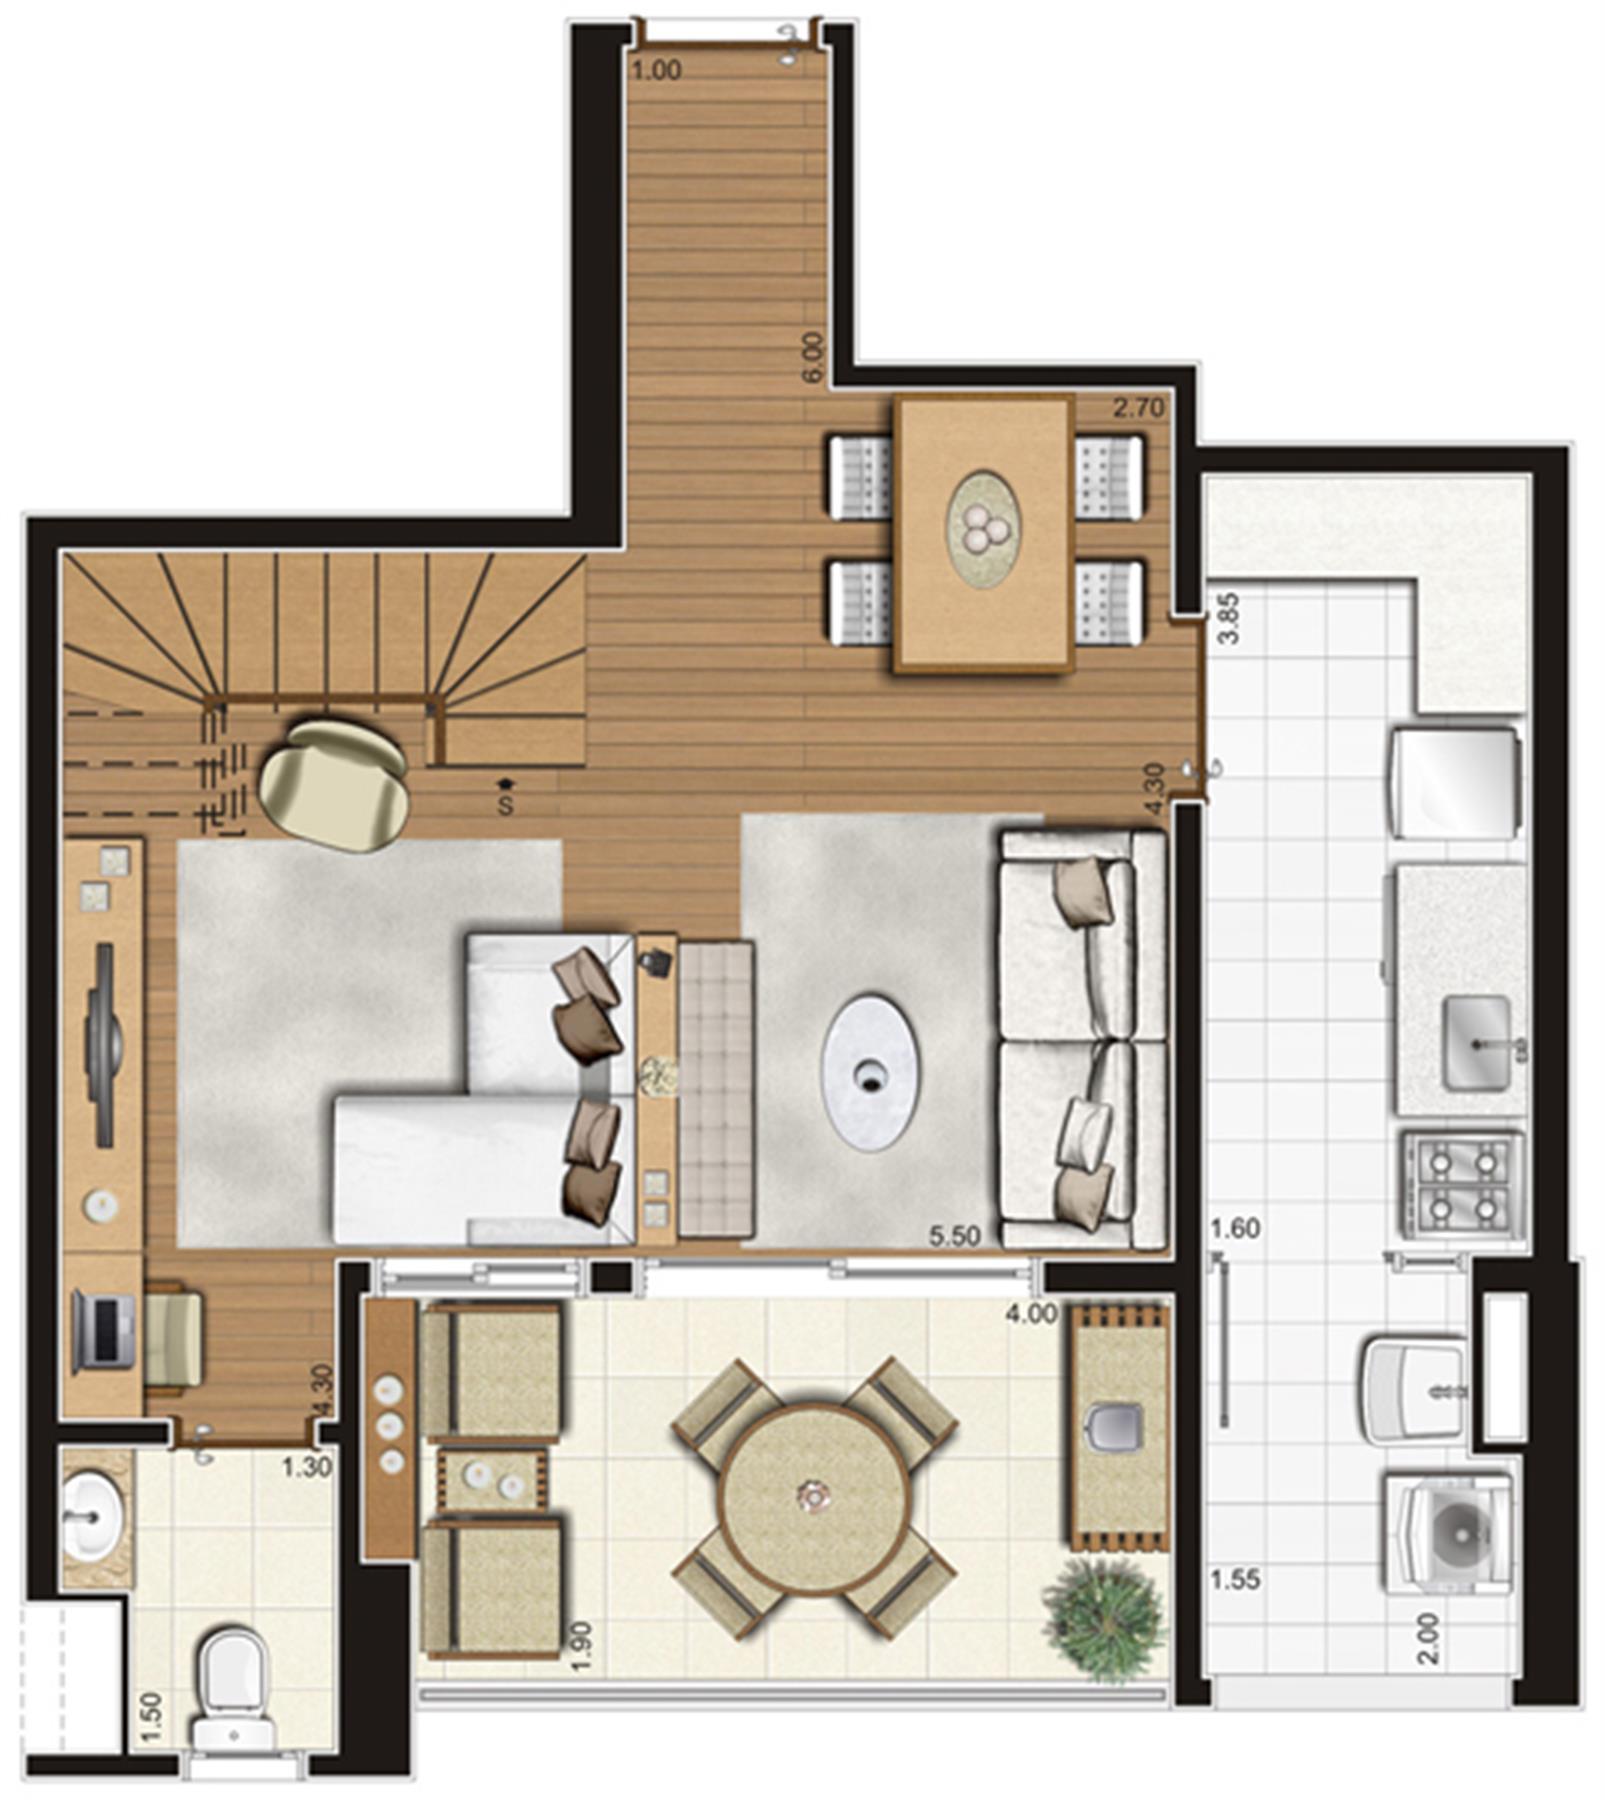 Planta-tipo do pavimento inferior do apartamento duplex de 95 m² privativos, finais 5 e 10   Tempo Bello – Apartamentono  Campo Belo - São Paulo - São Paulo